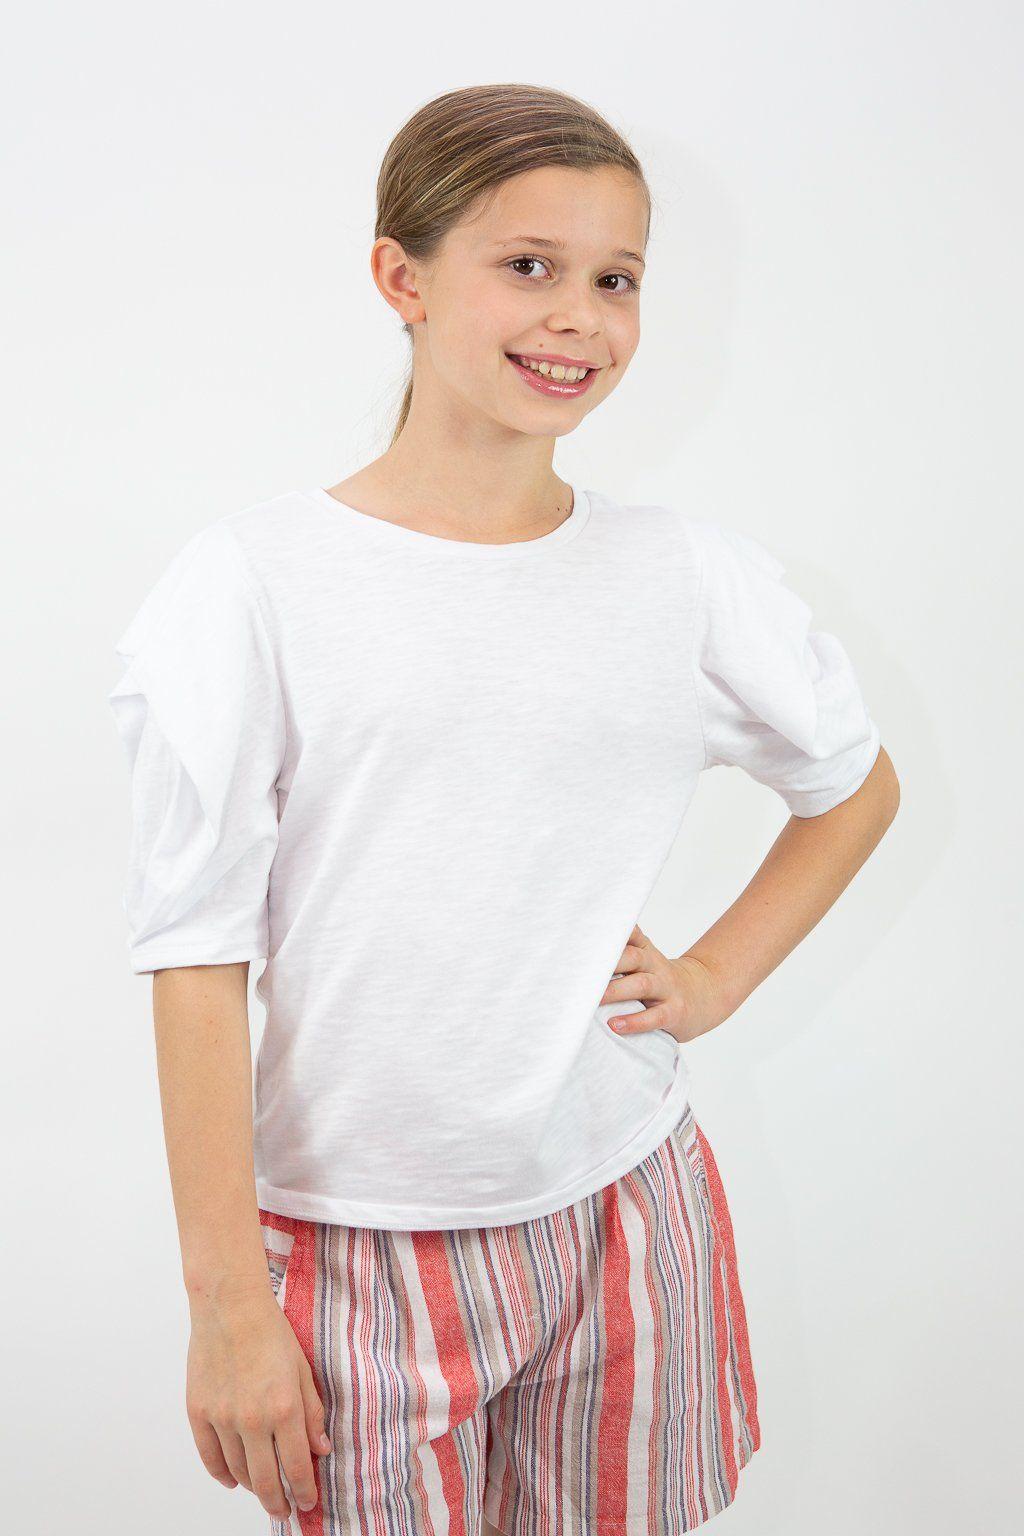 Pin on Spring & Summer Fashion